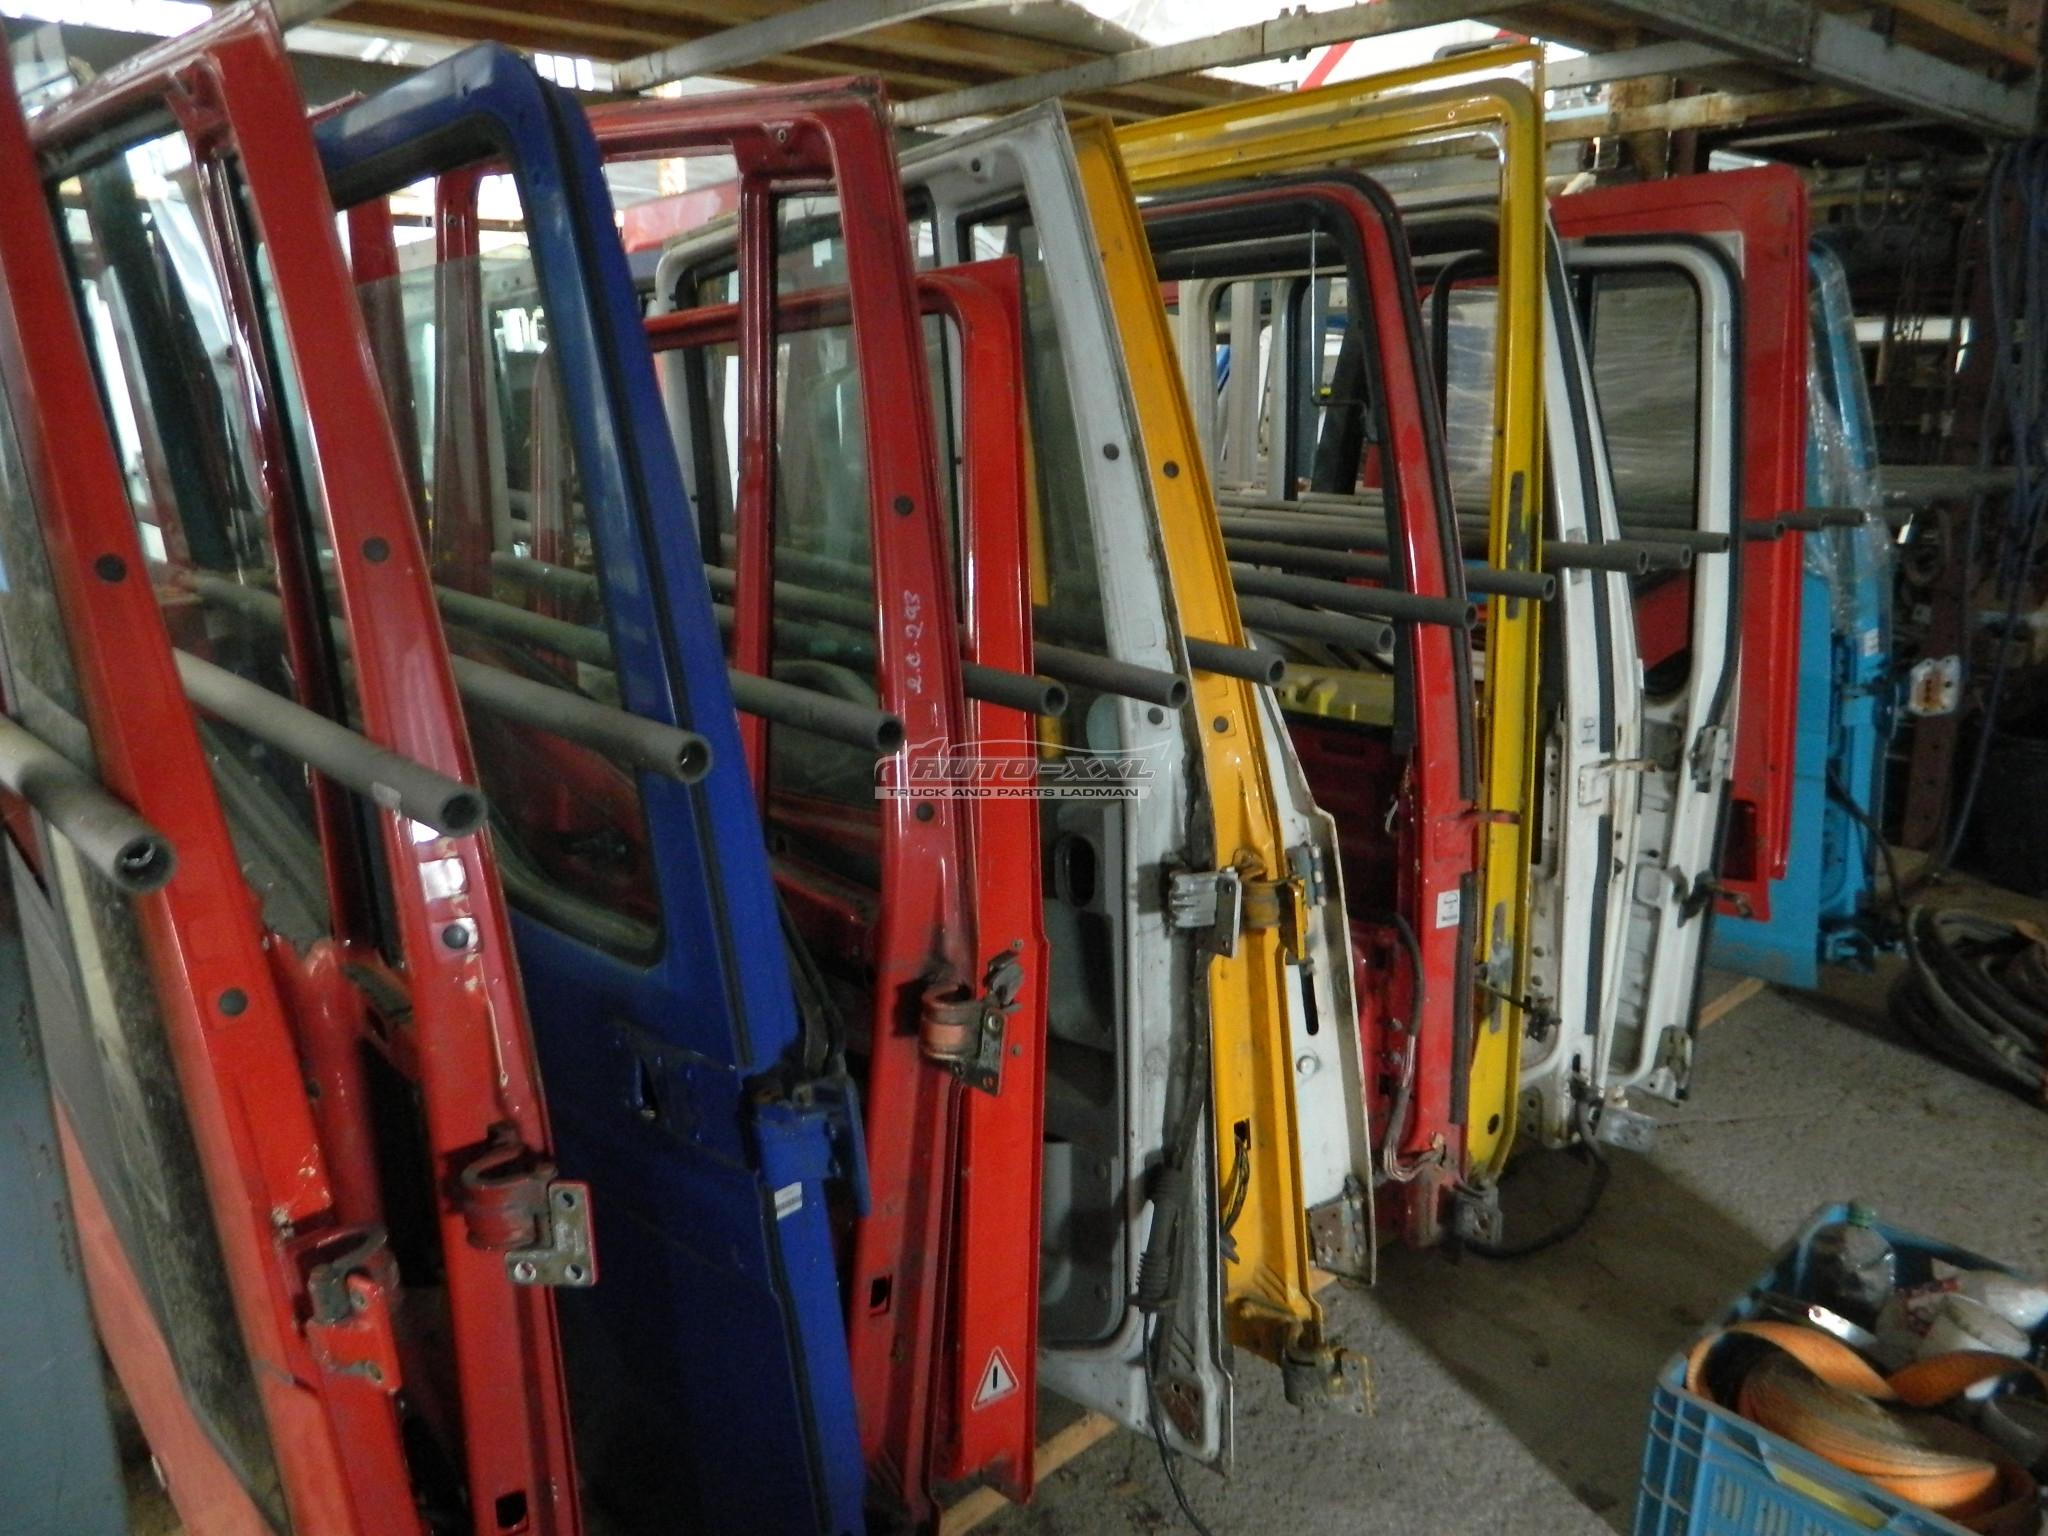 dveře - levé i pravé, velký výběr na vozy MAN, DAF, SCANIA, VOLVO, IVECO, RENAULT, MB